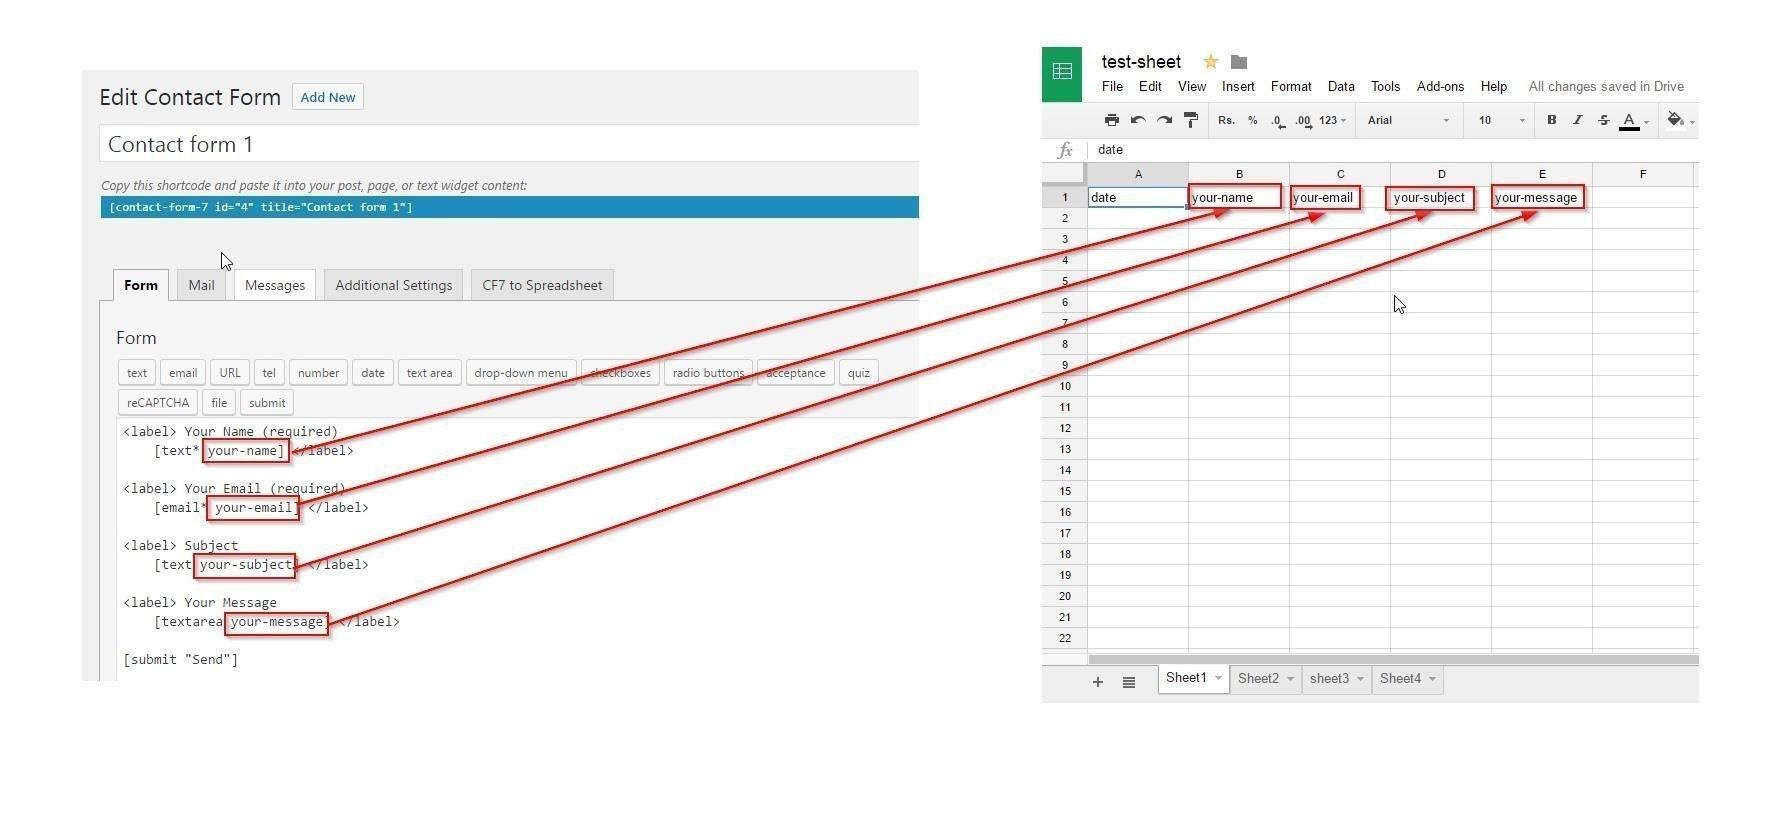 How To Spreadsheet Regarding Cf7 To Spreadsheet – Ultimate Addons For Beaver Builder